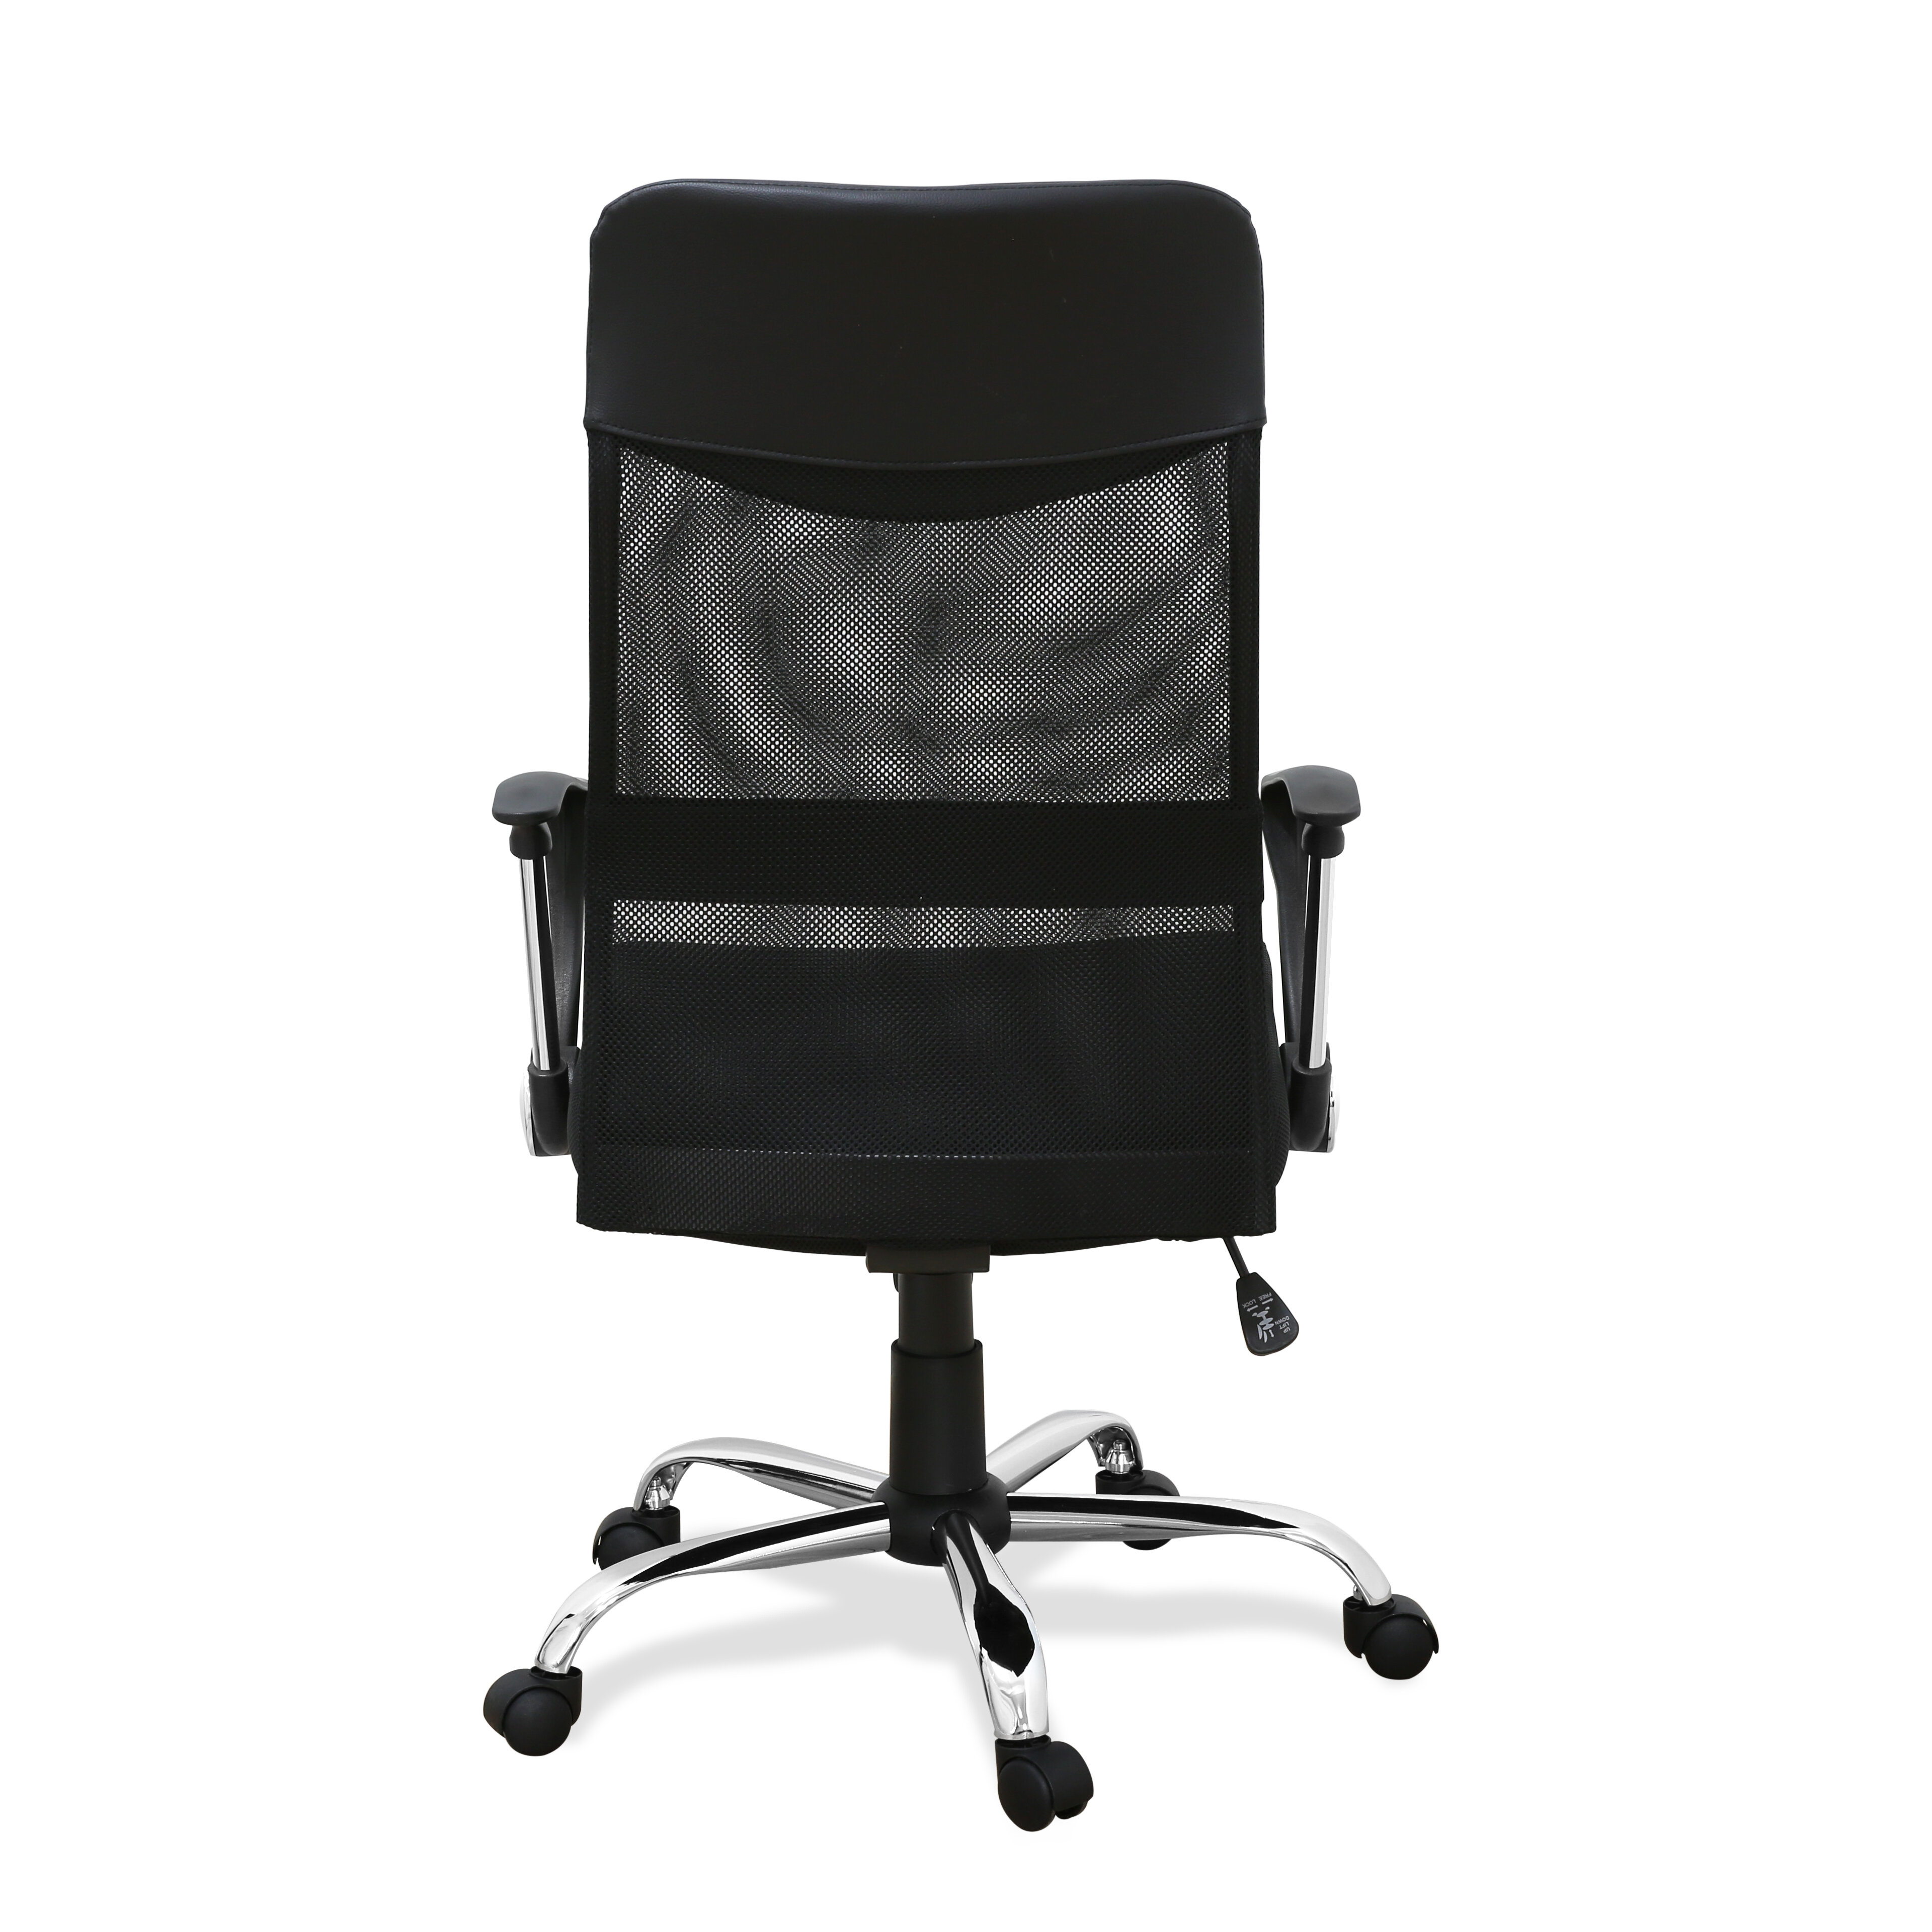 Symple Stuff Hidup High Back Desk Chair | Wayfair